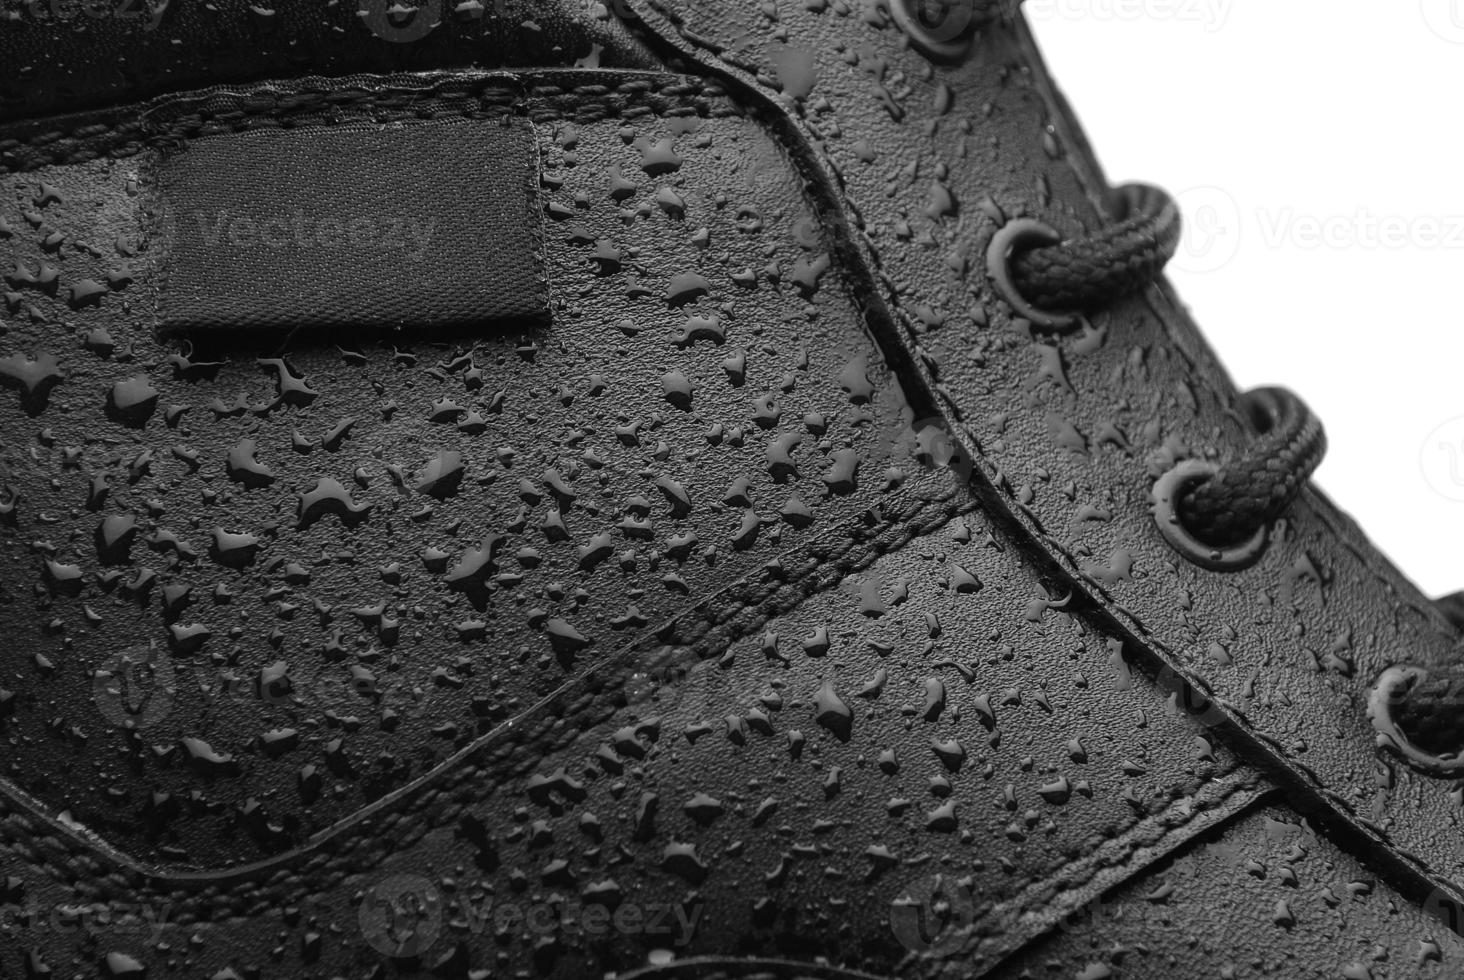 Waterproof shoe photo